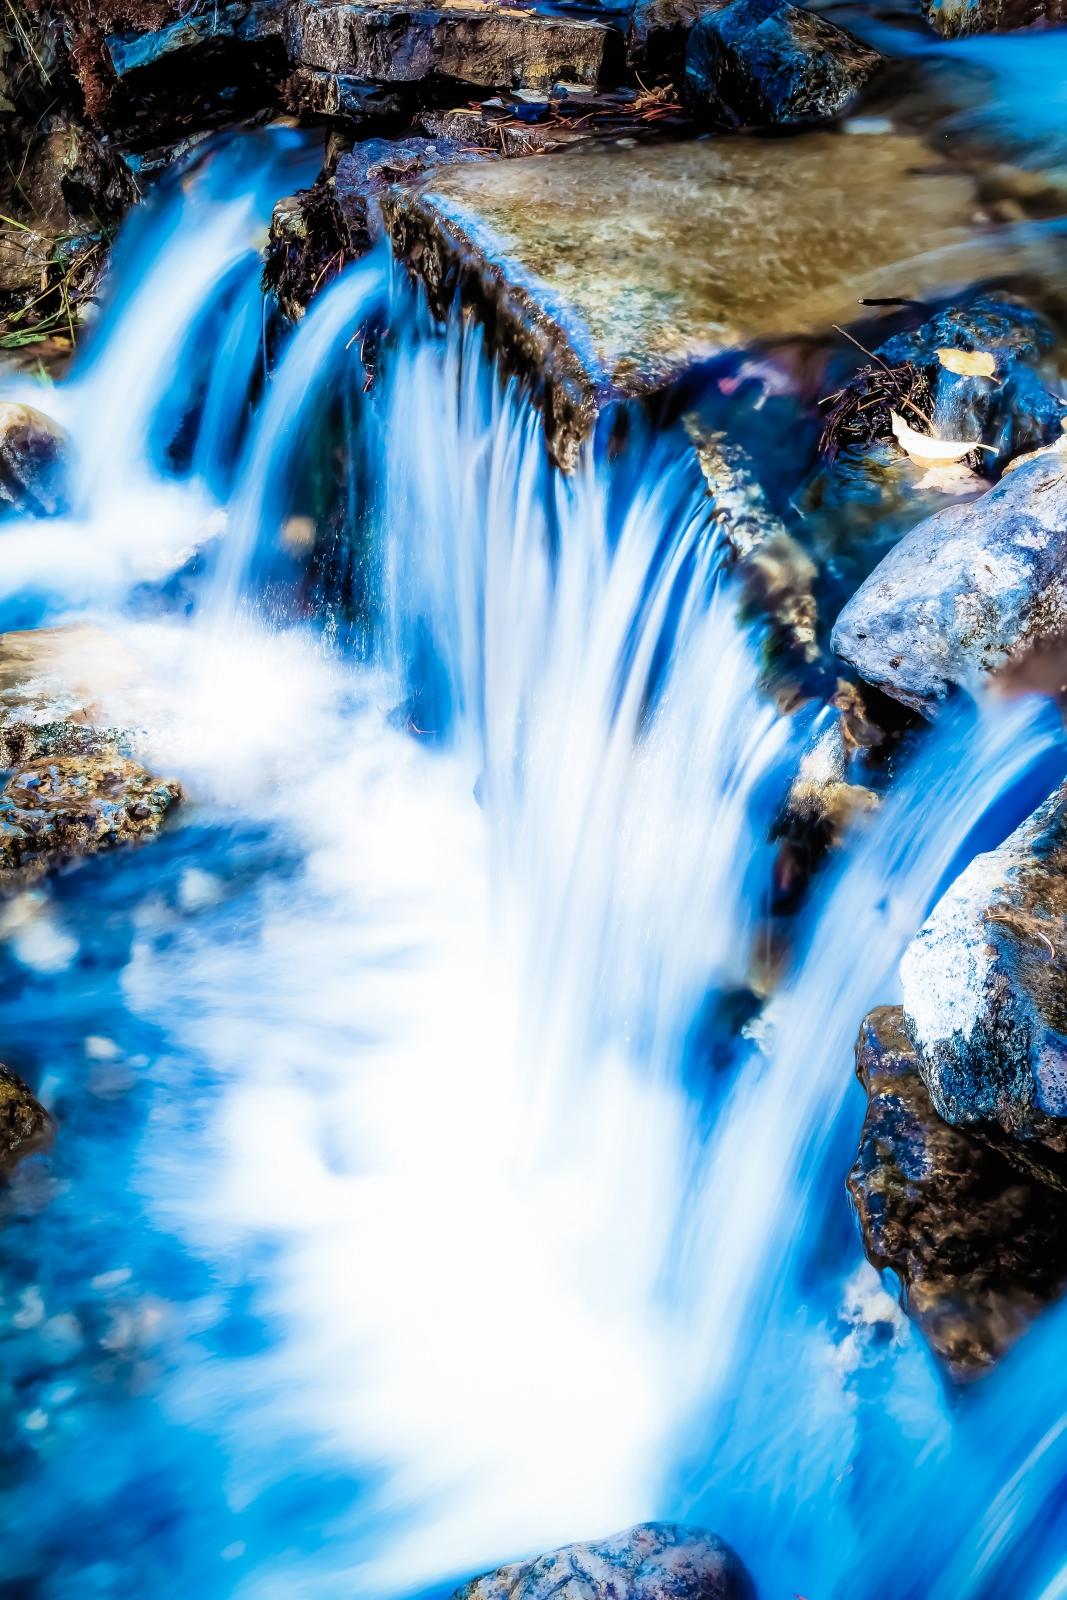 Water Lens - Kananaskis, Alberta 3